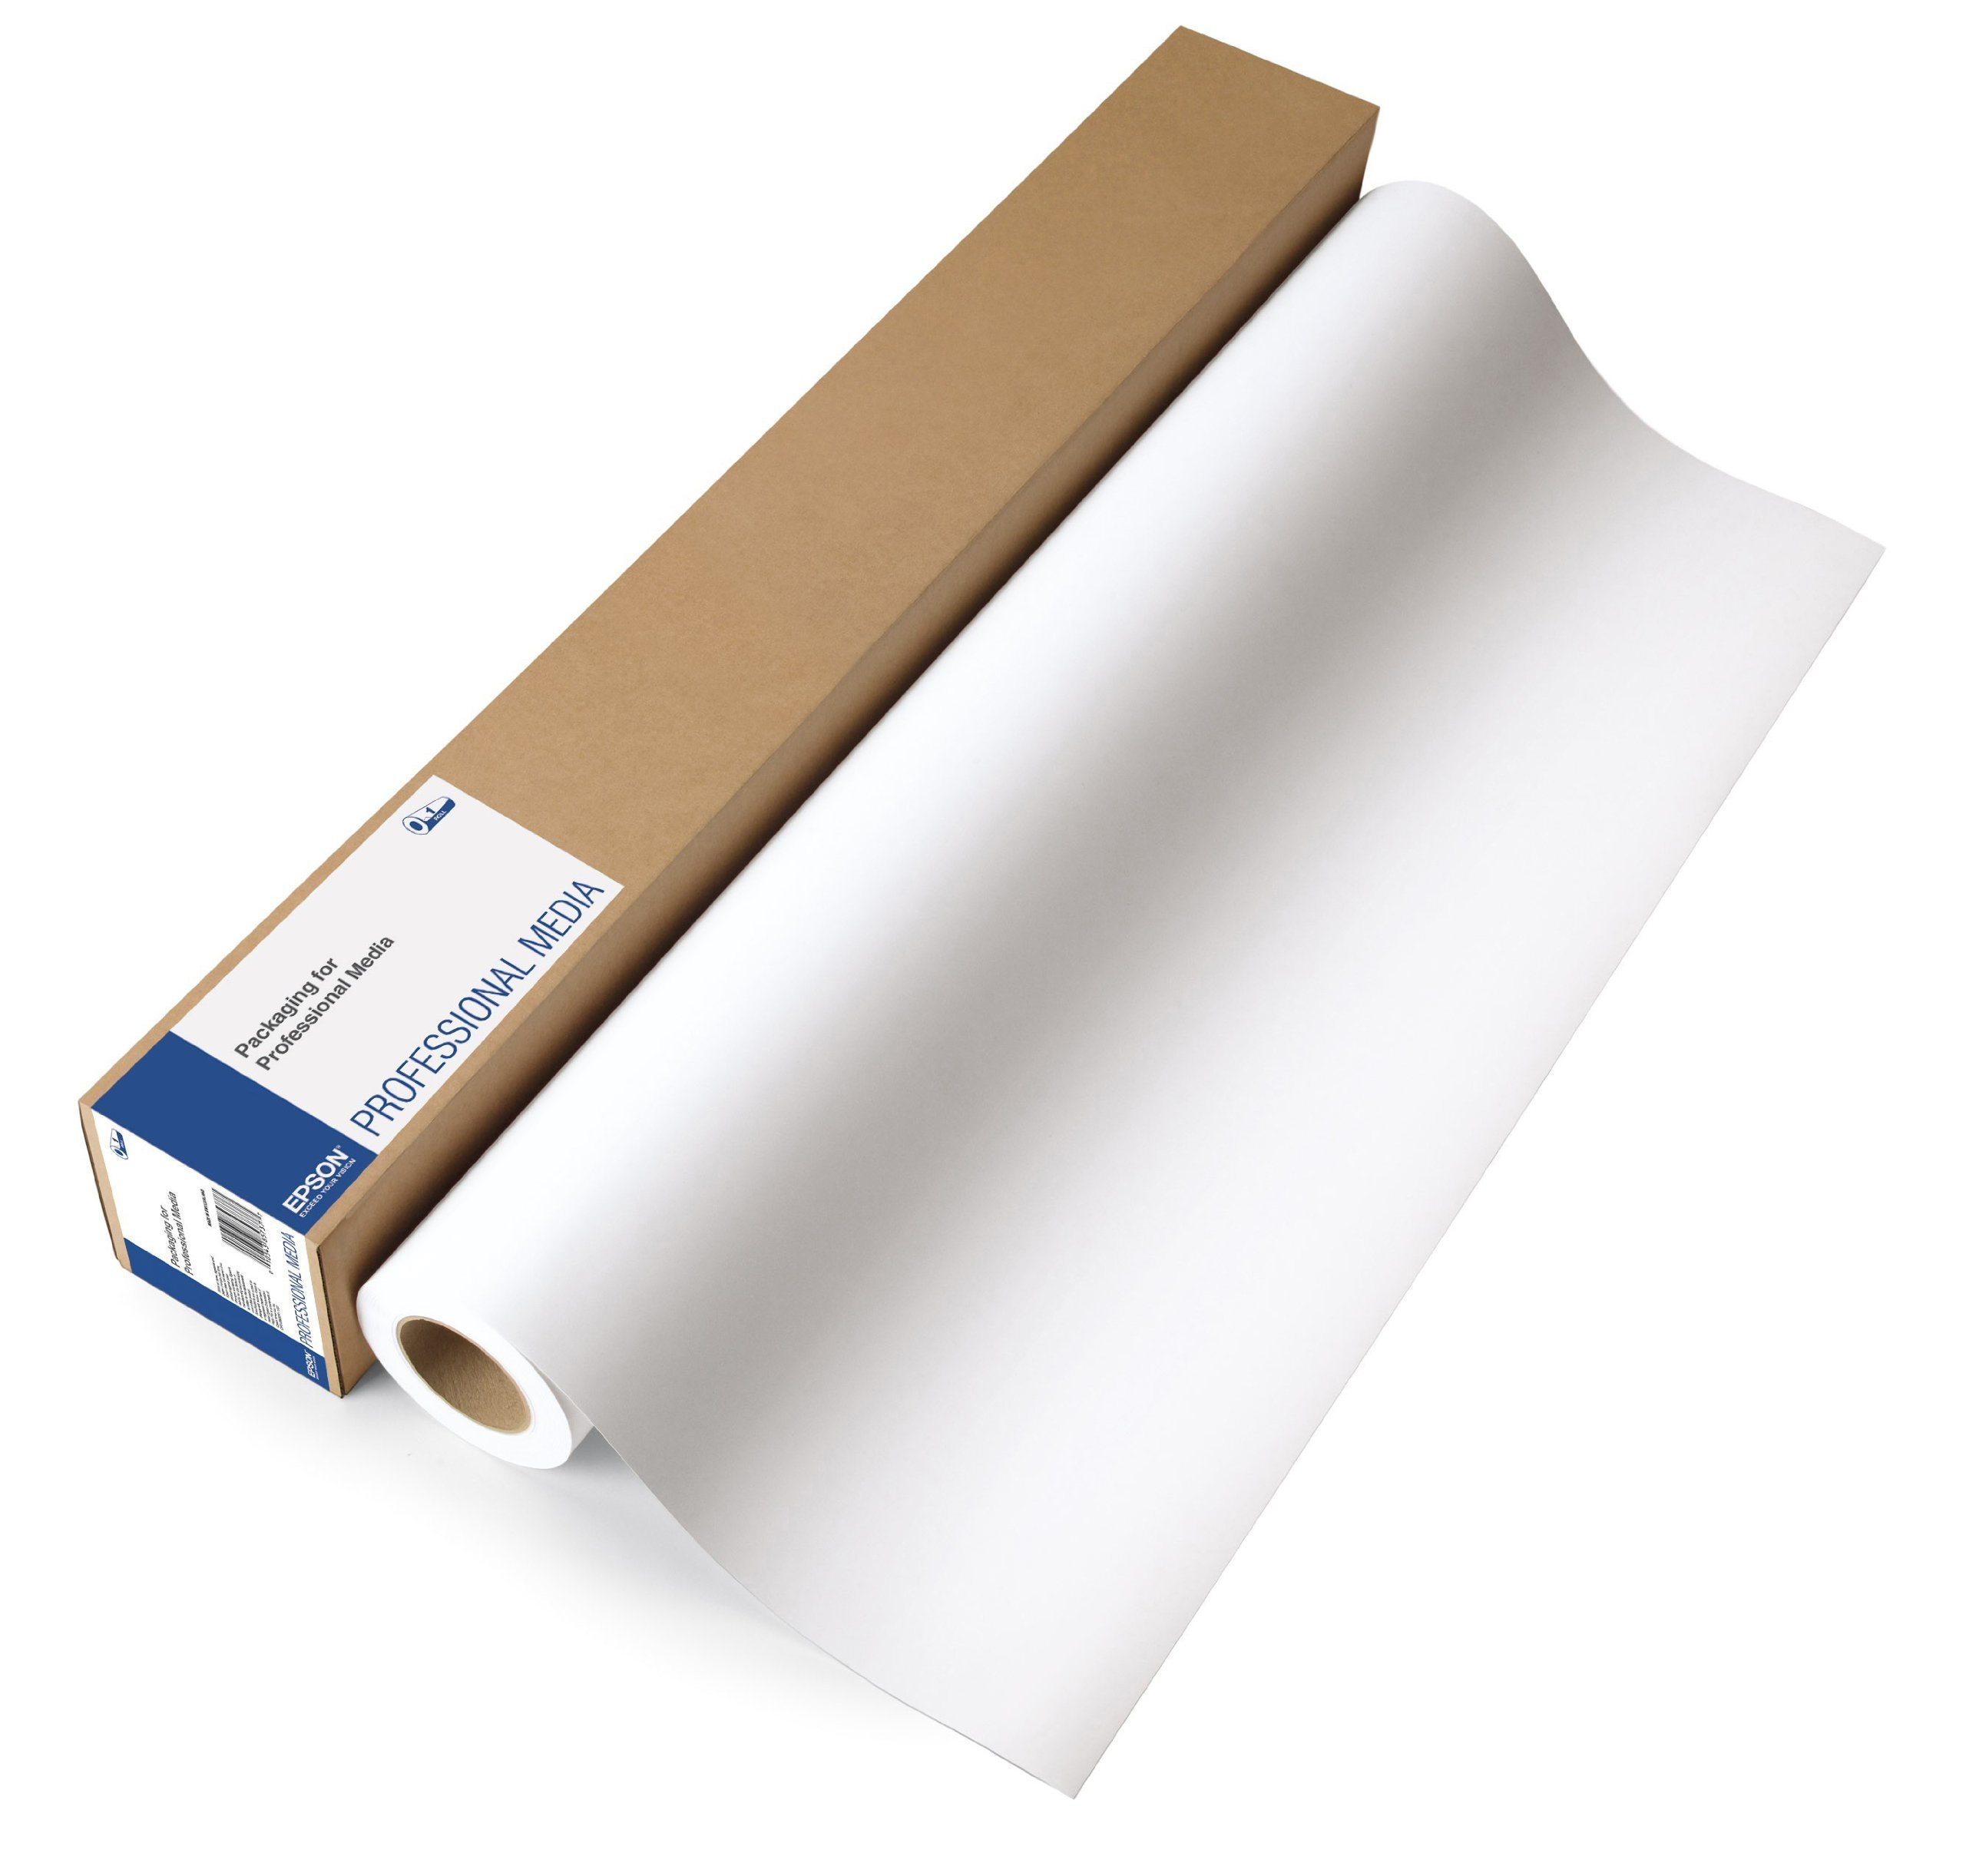 Epson Premium Luster Photo Paper, 260, 10''x100' Roll, White (S042077)